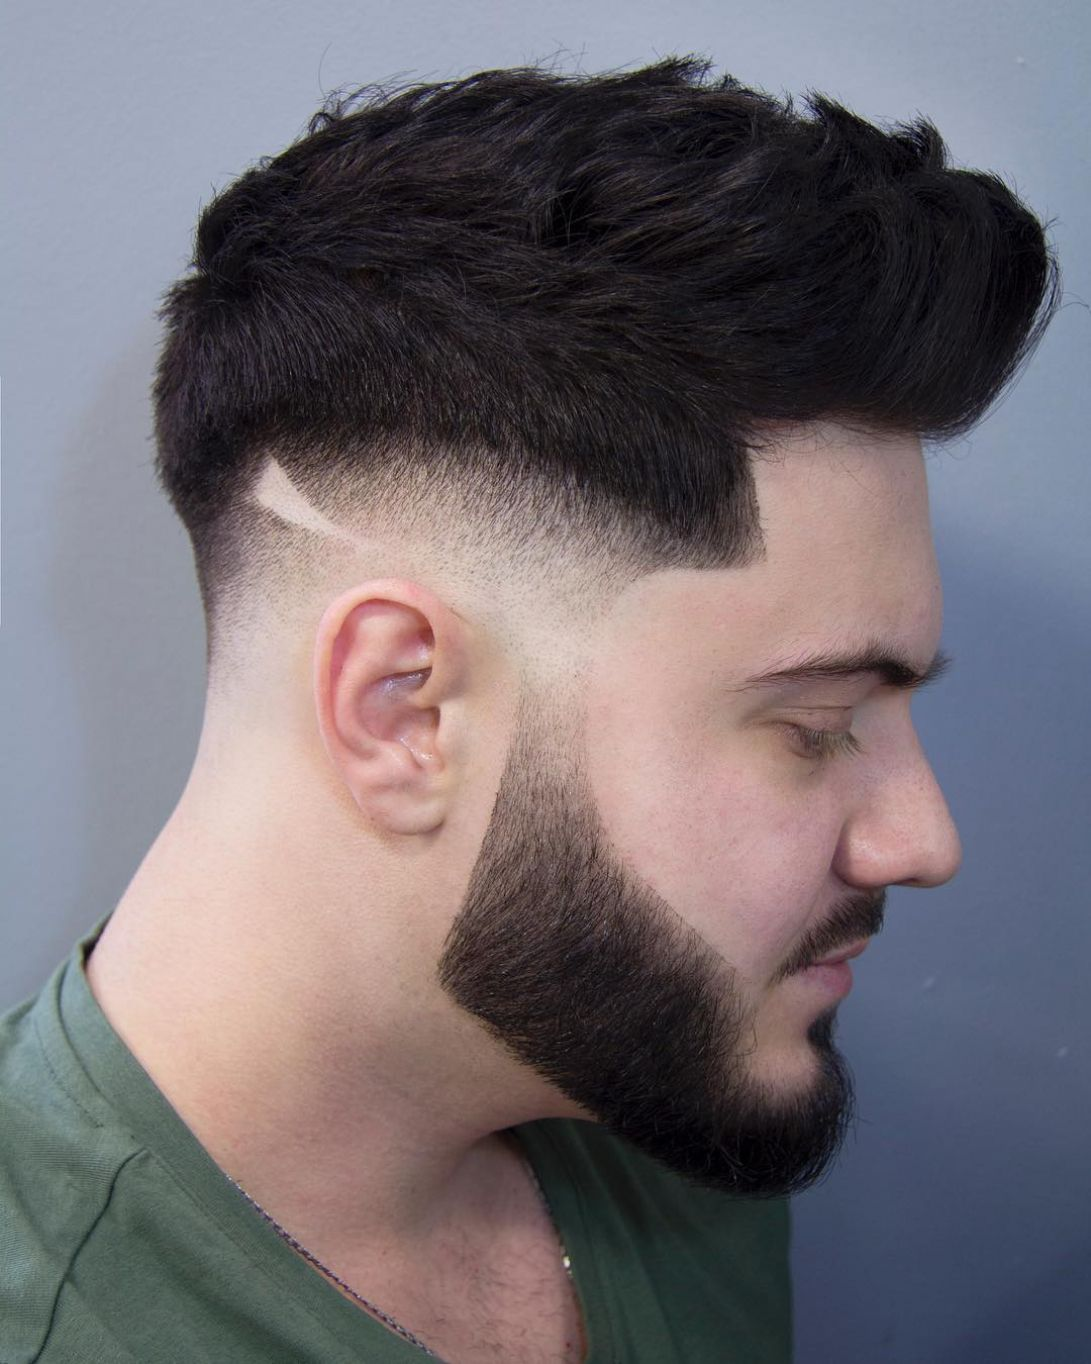 Cool Beard Trim Styles 2019 Get Male Men Hairstyle Beard Trim